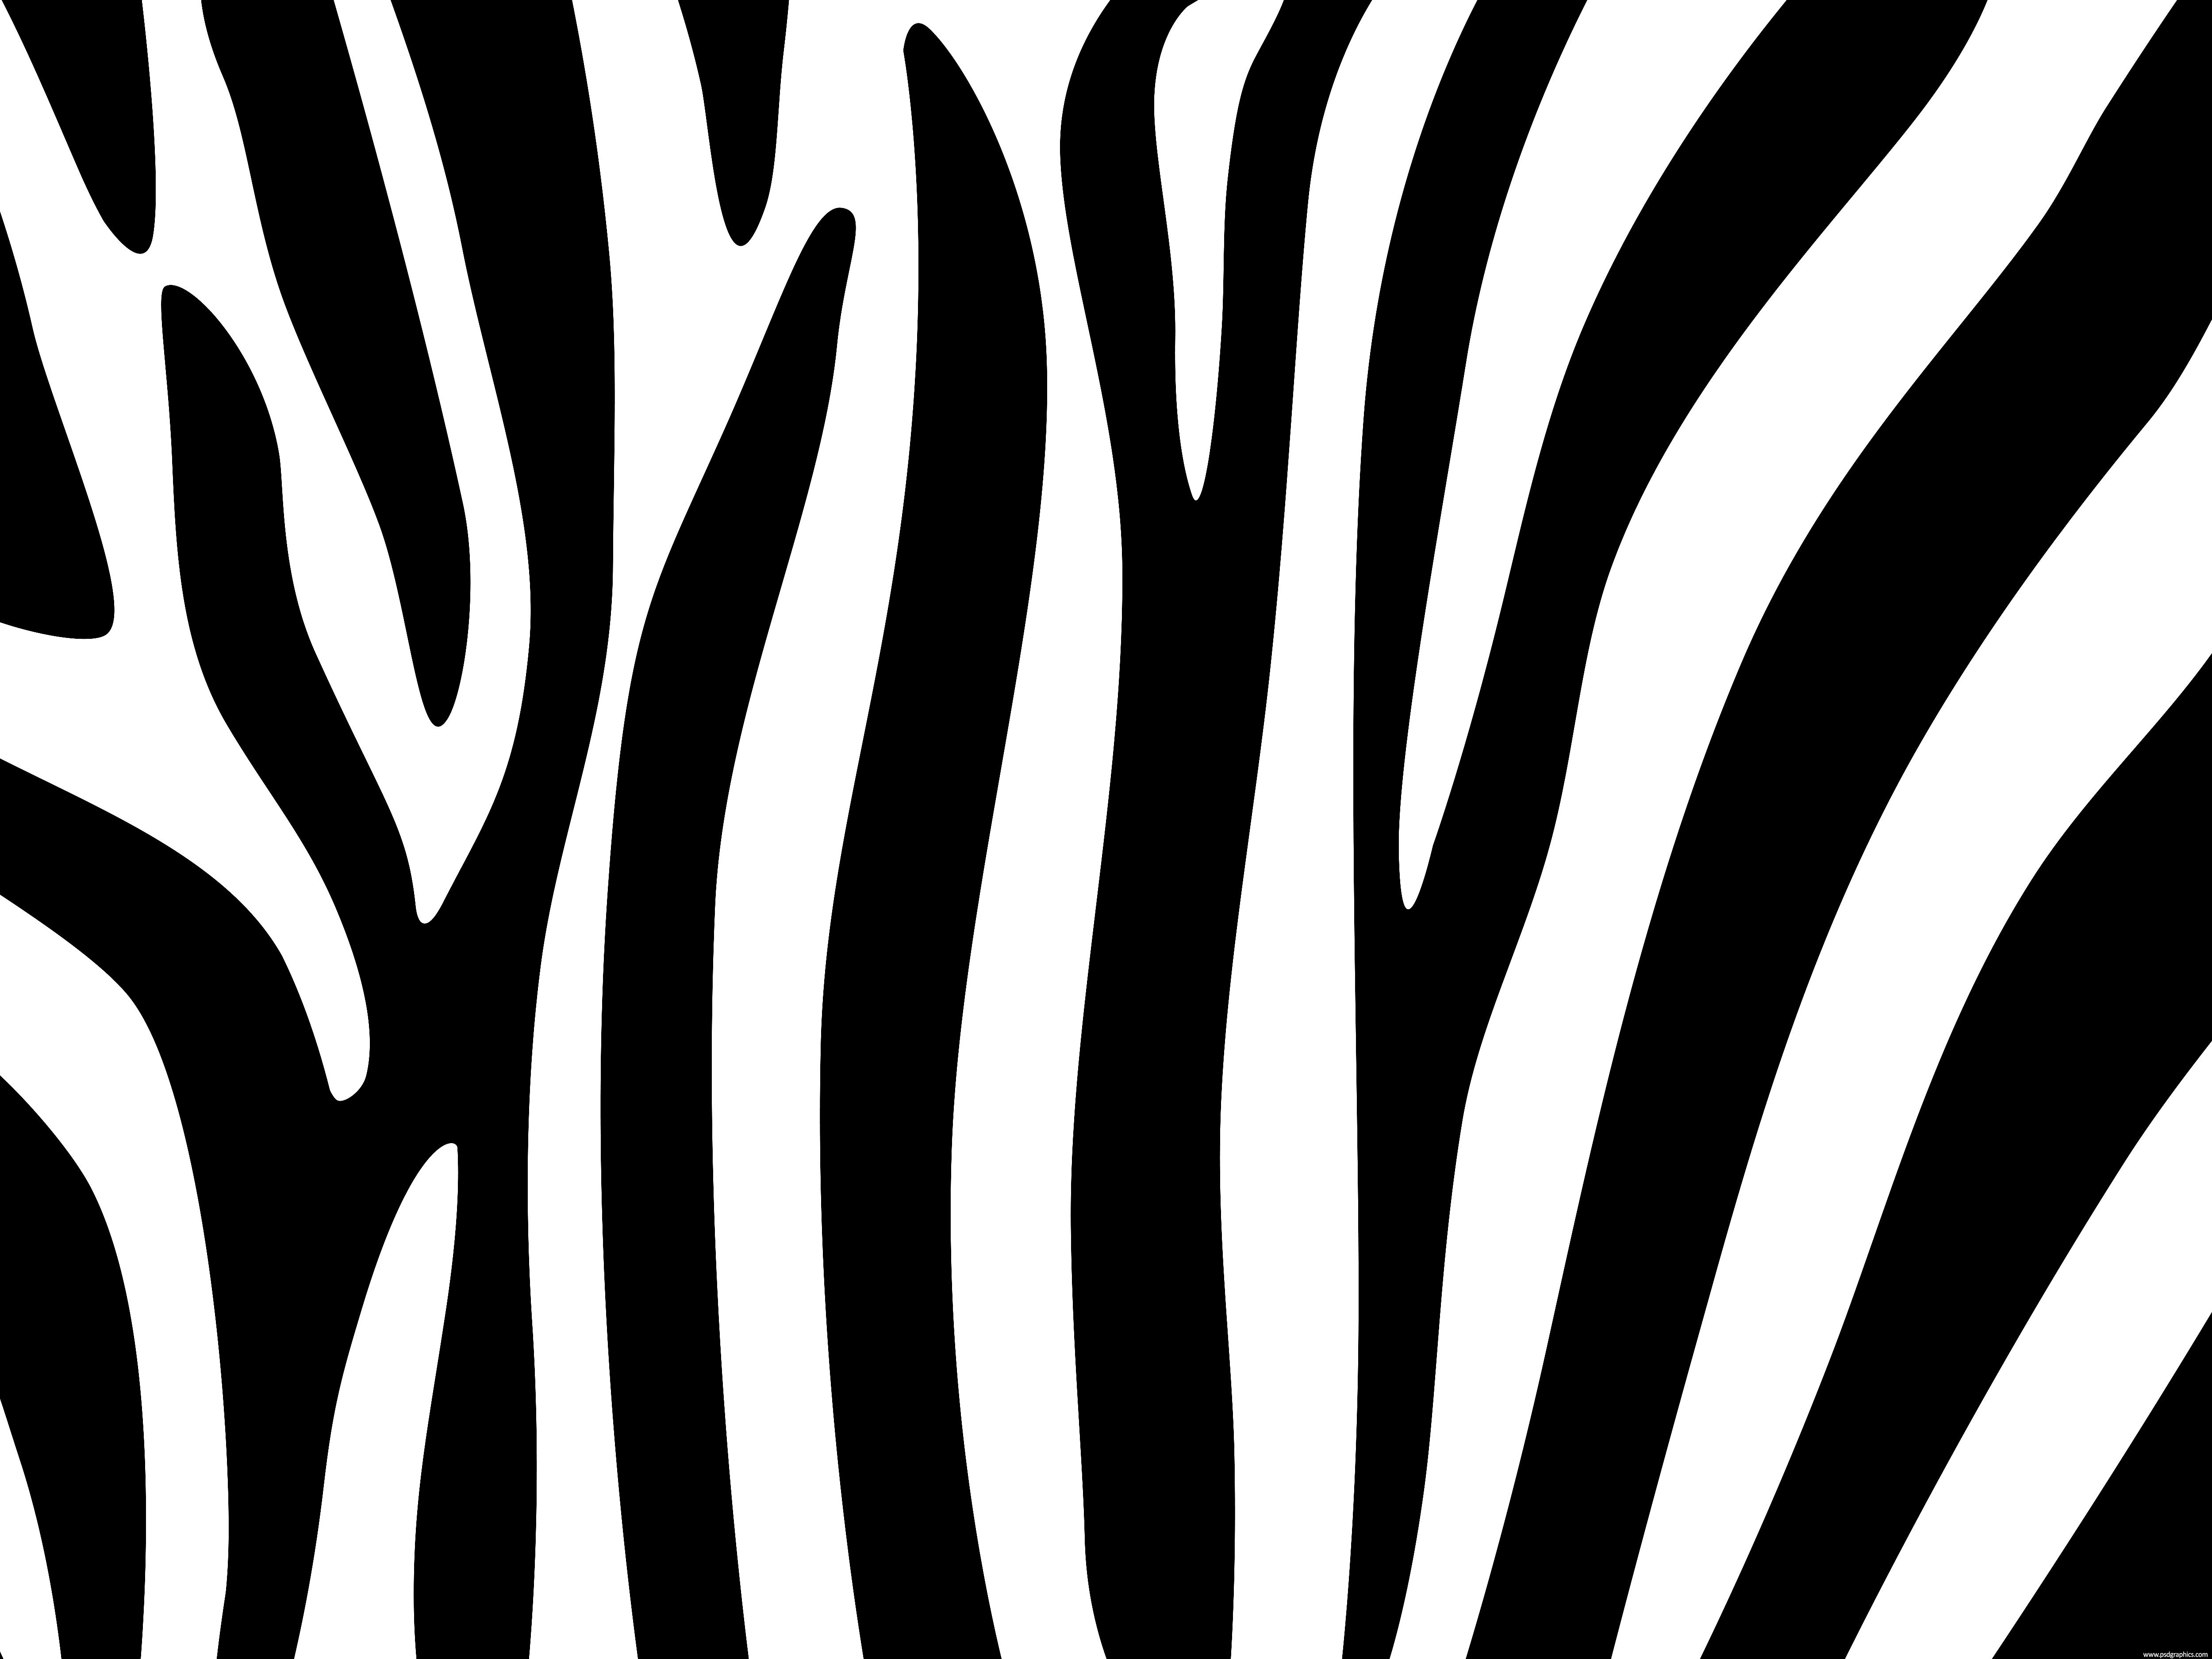 Zebra stripes design PSDGraphics 5000x3750